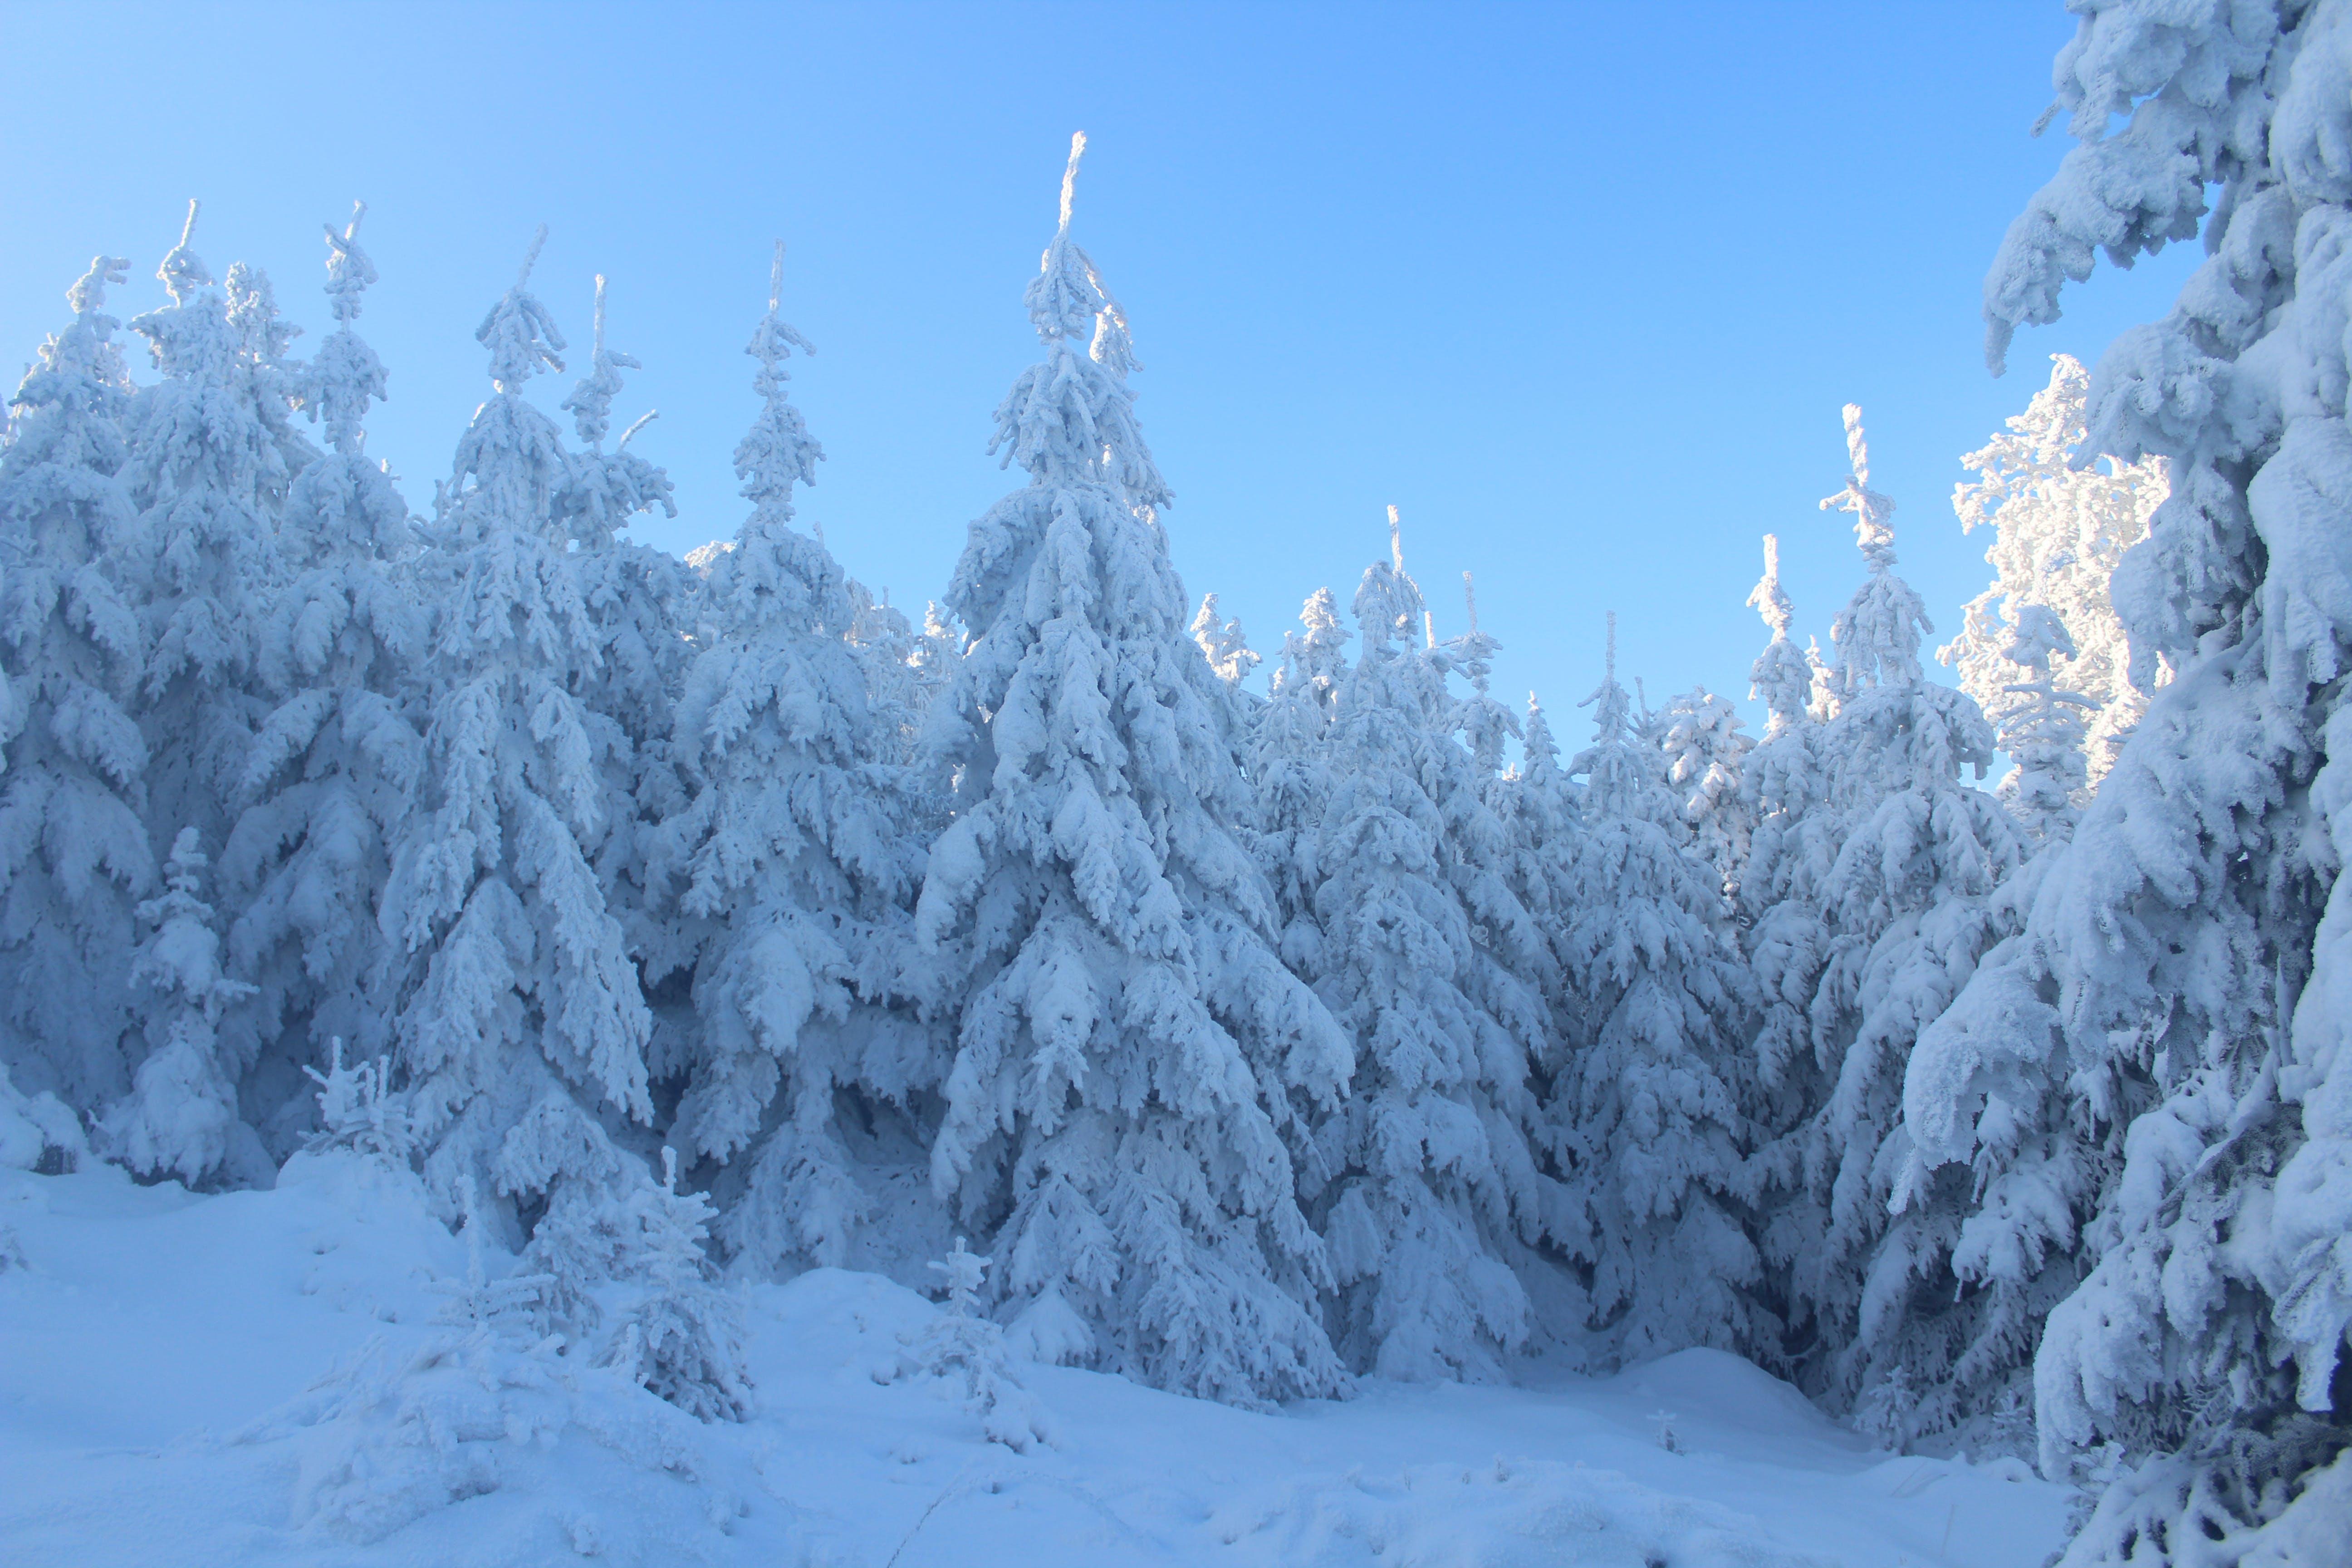 Gratis arkivbilde med årstid, blå himmel, dagslys, forkjølelse